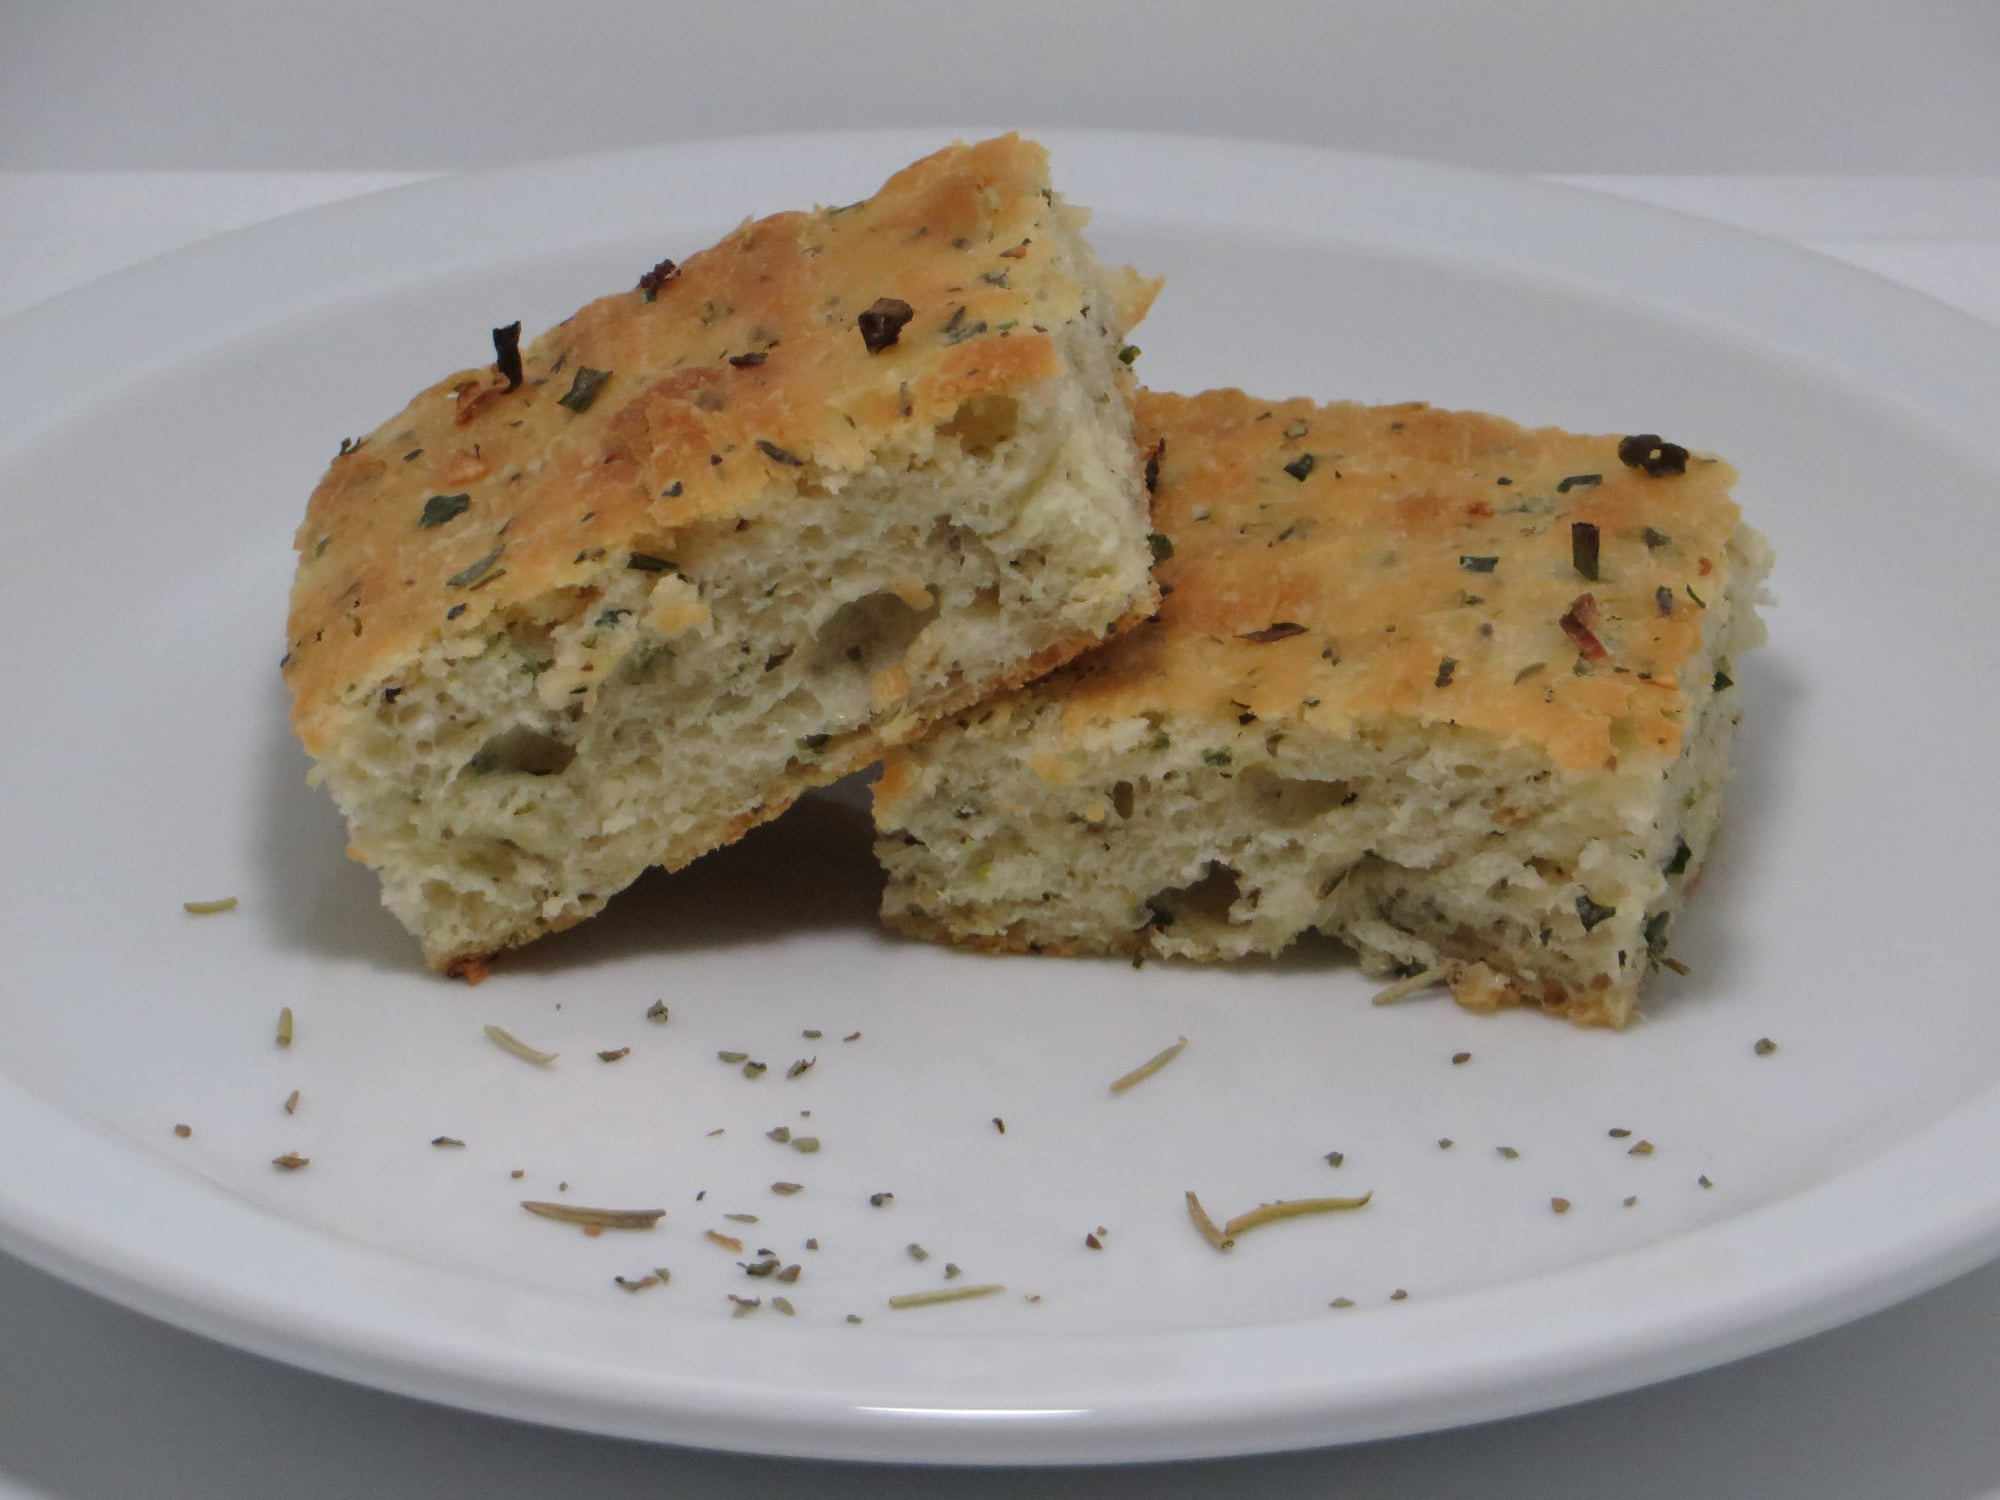 Herb-Garlic Focaccia Toast